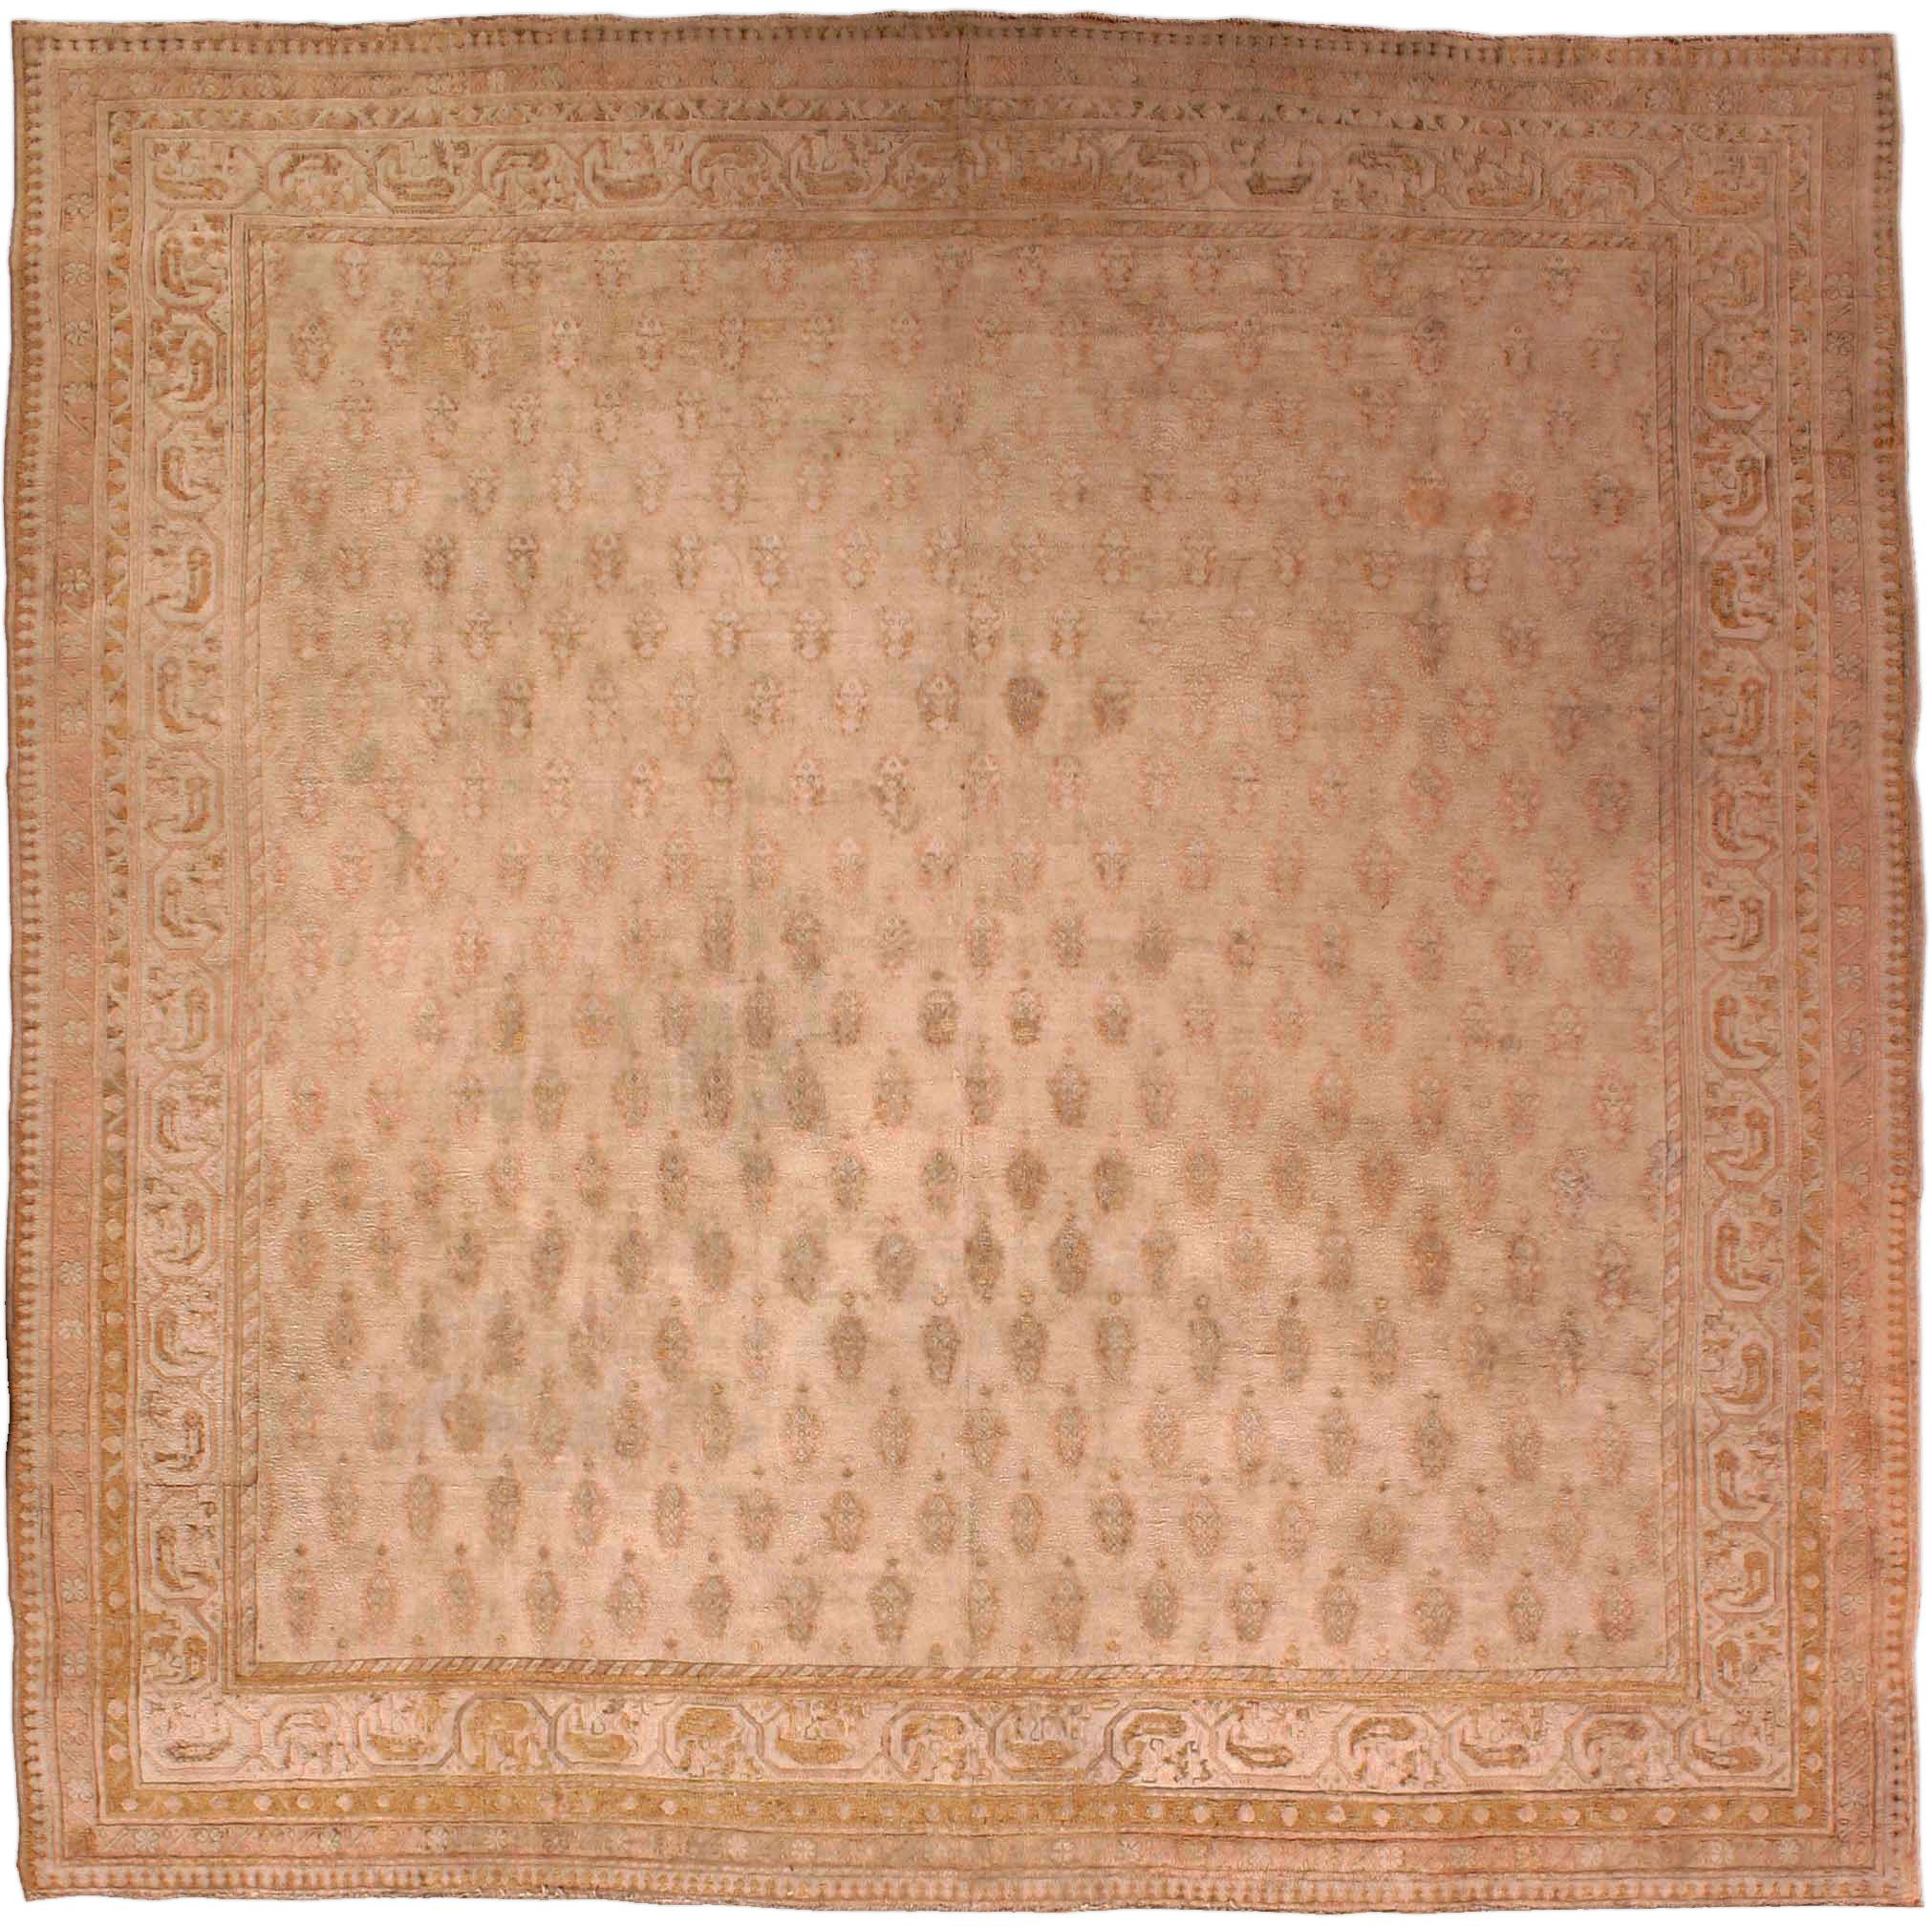 Vintage Indian Cotton Agra Carpet BB2689